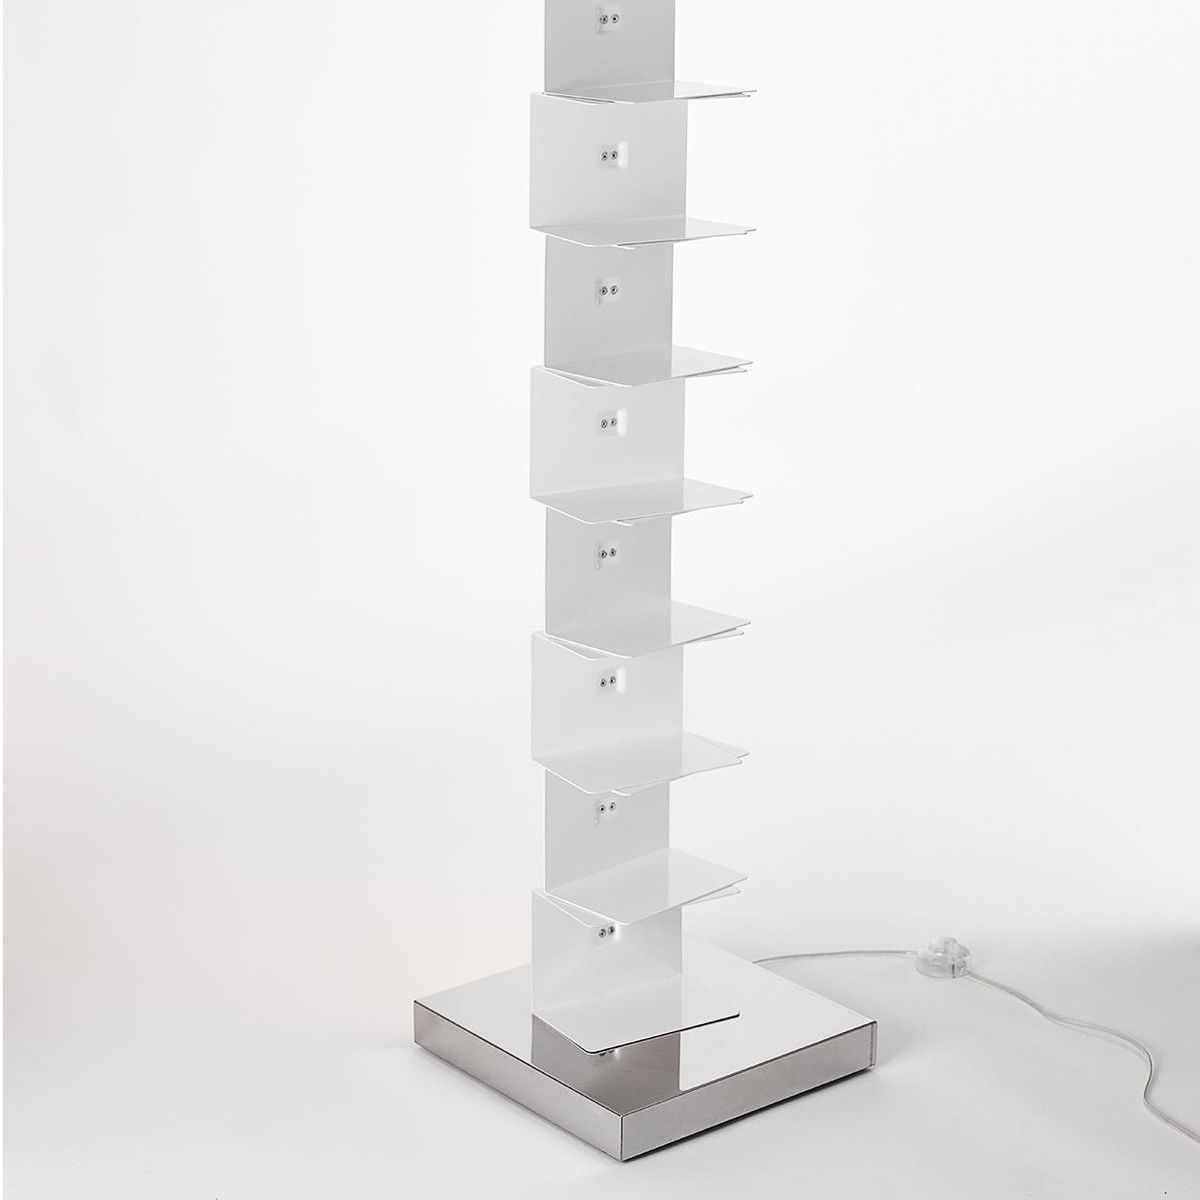 ptolomeo luce 215 biblioth que colonne led opinion ciatti. Black Bedroom Furniture Sets. Home Design Ideas